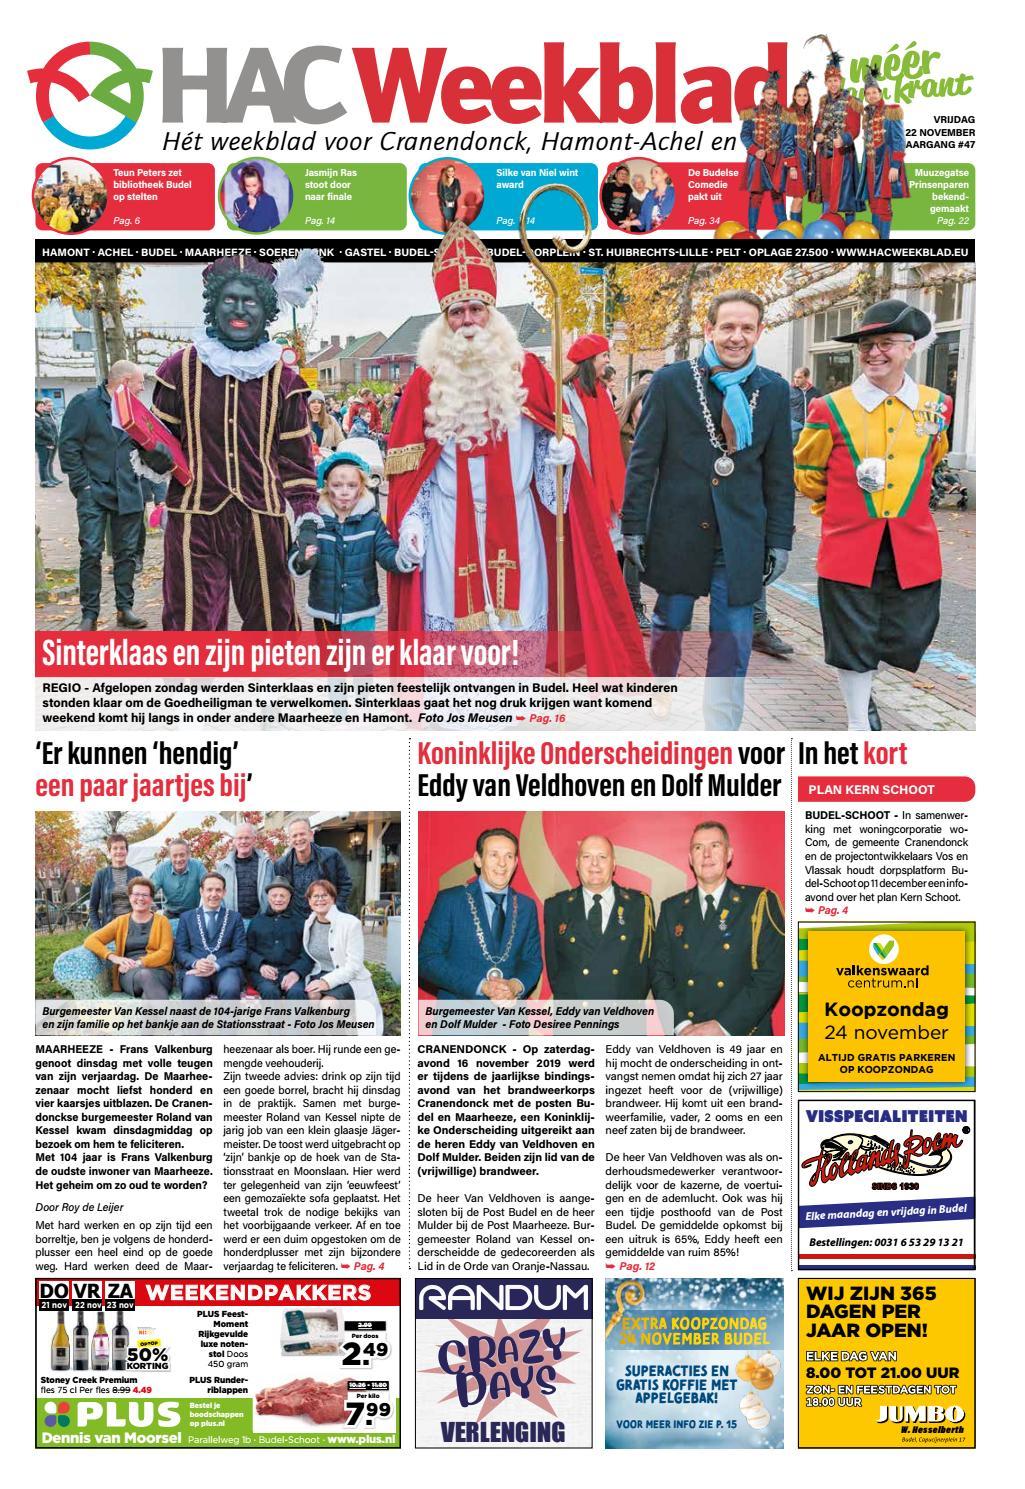 Hac Weekblad Week 47 2019 Nl By Hac Weekblad Issuu